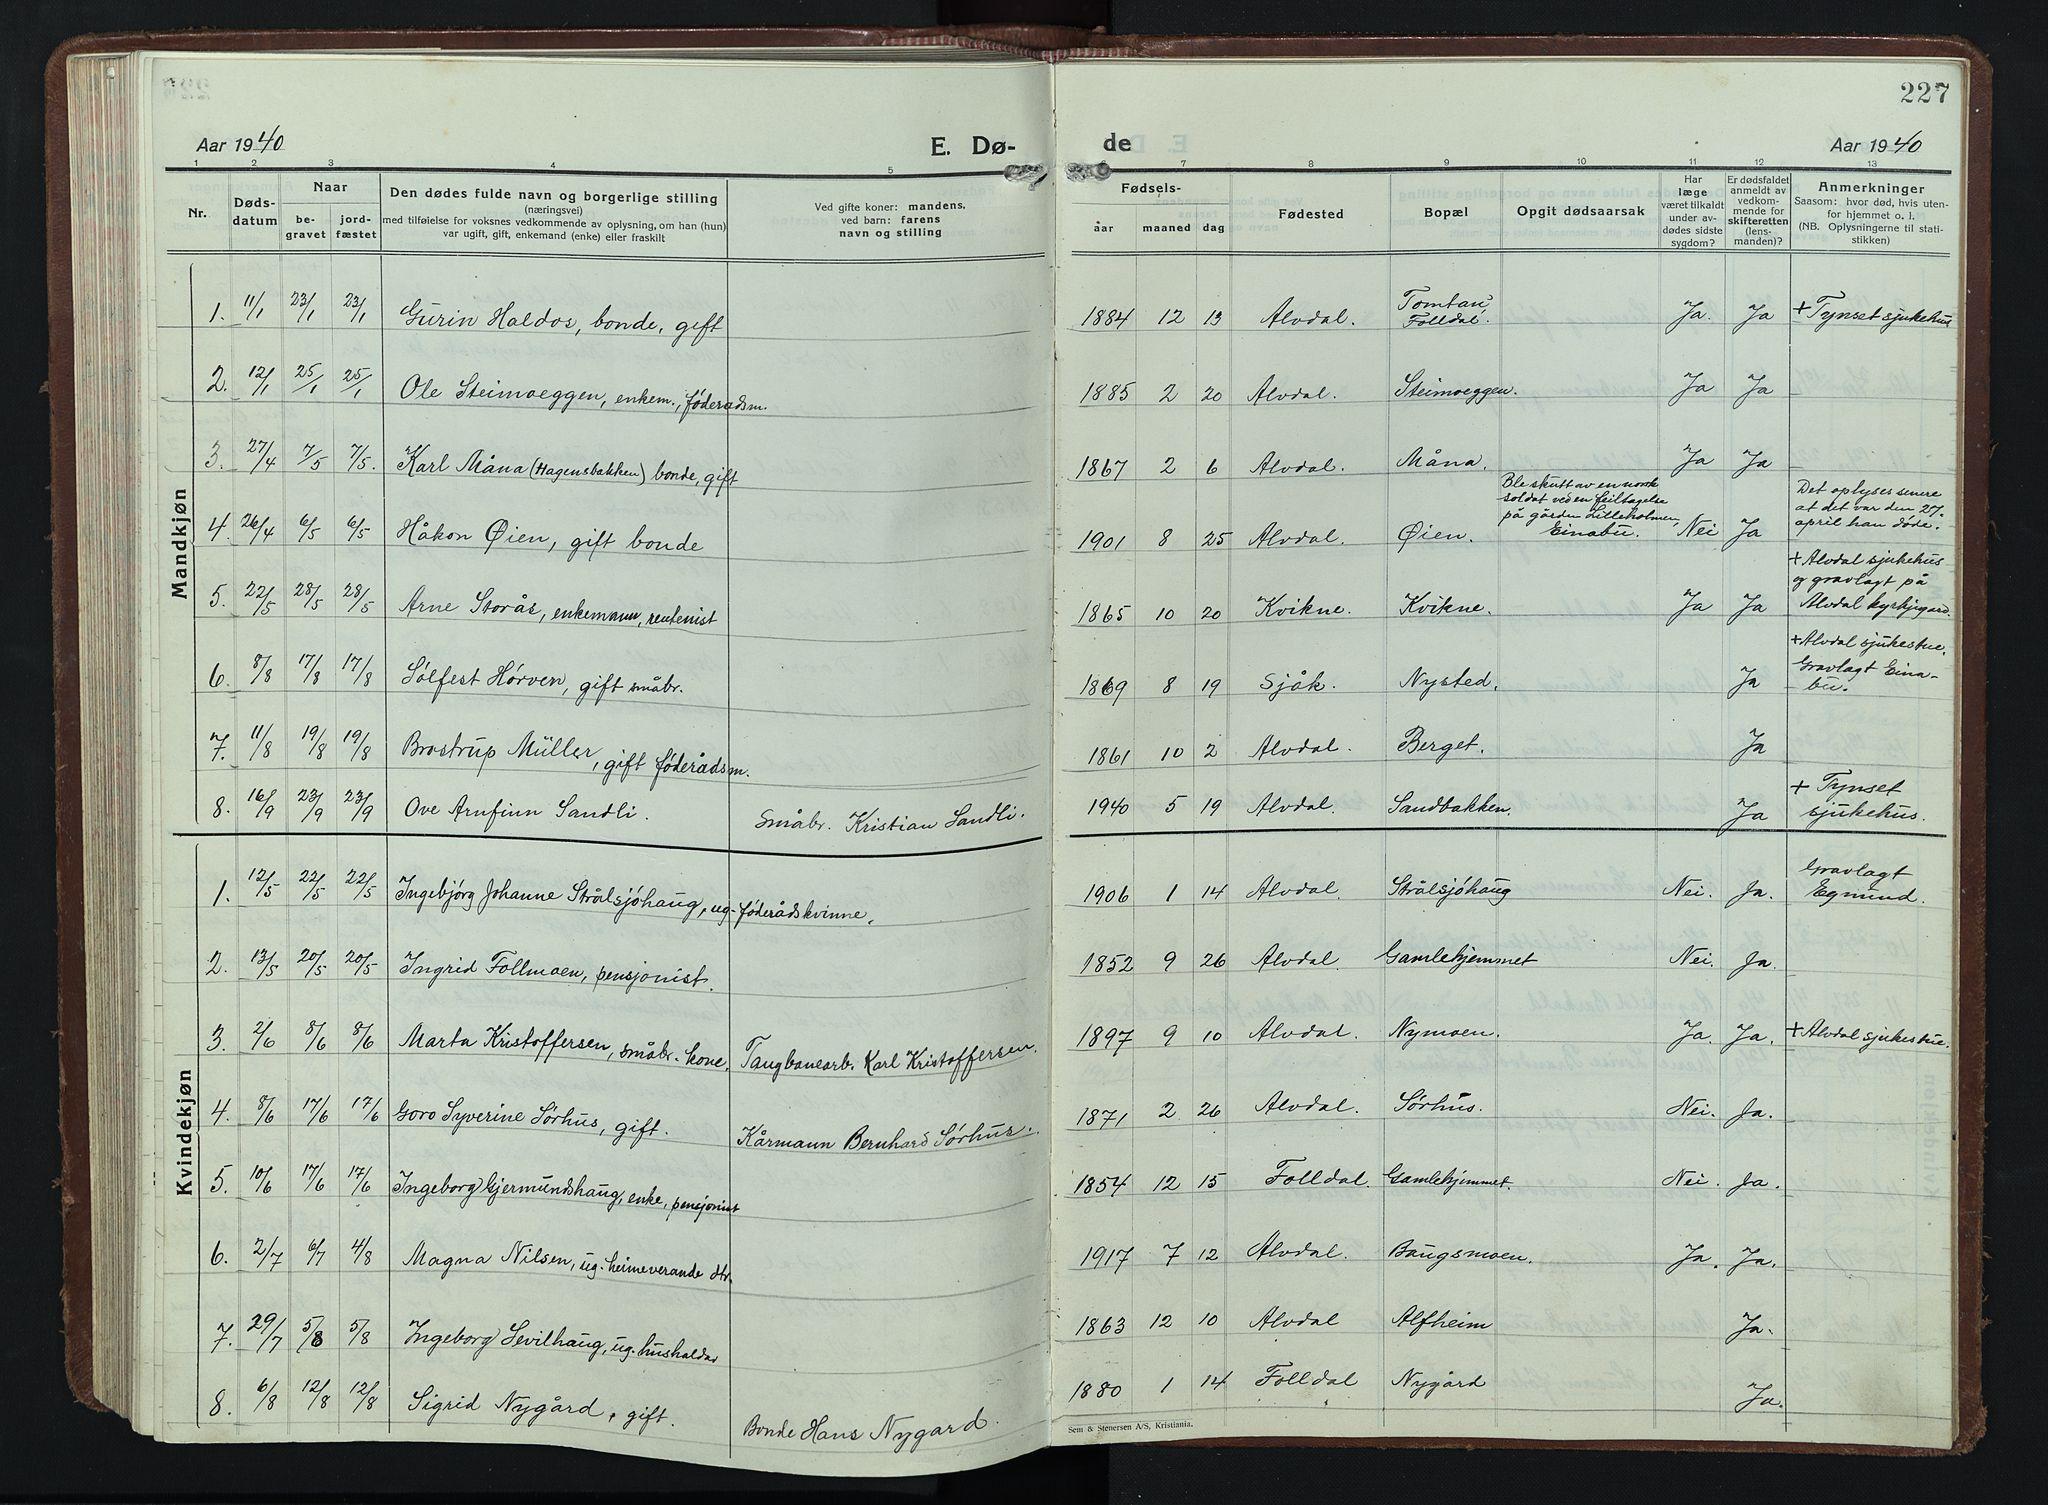 SAH, Alvdal prestekontor, Klokkerbok nr. 7, 1924-1945, s. 227